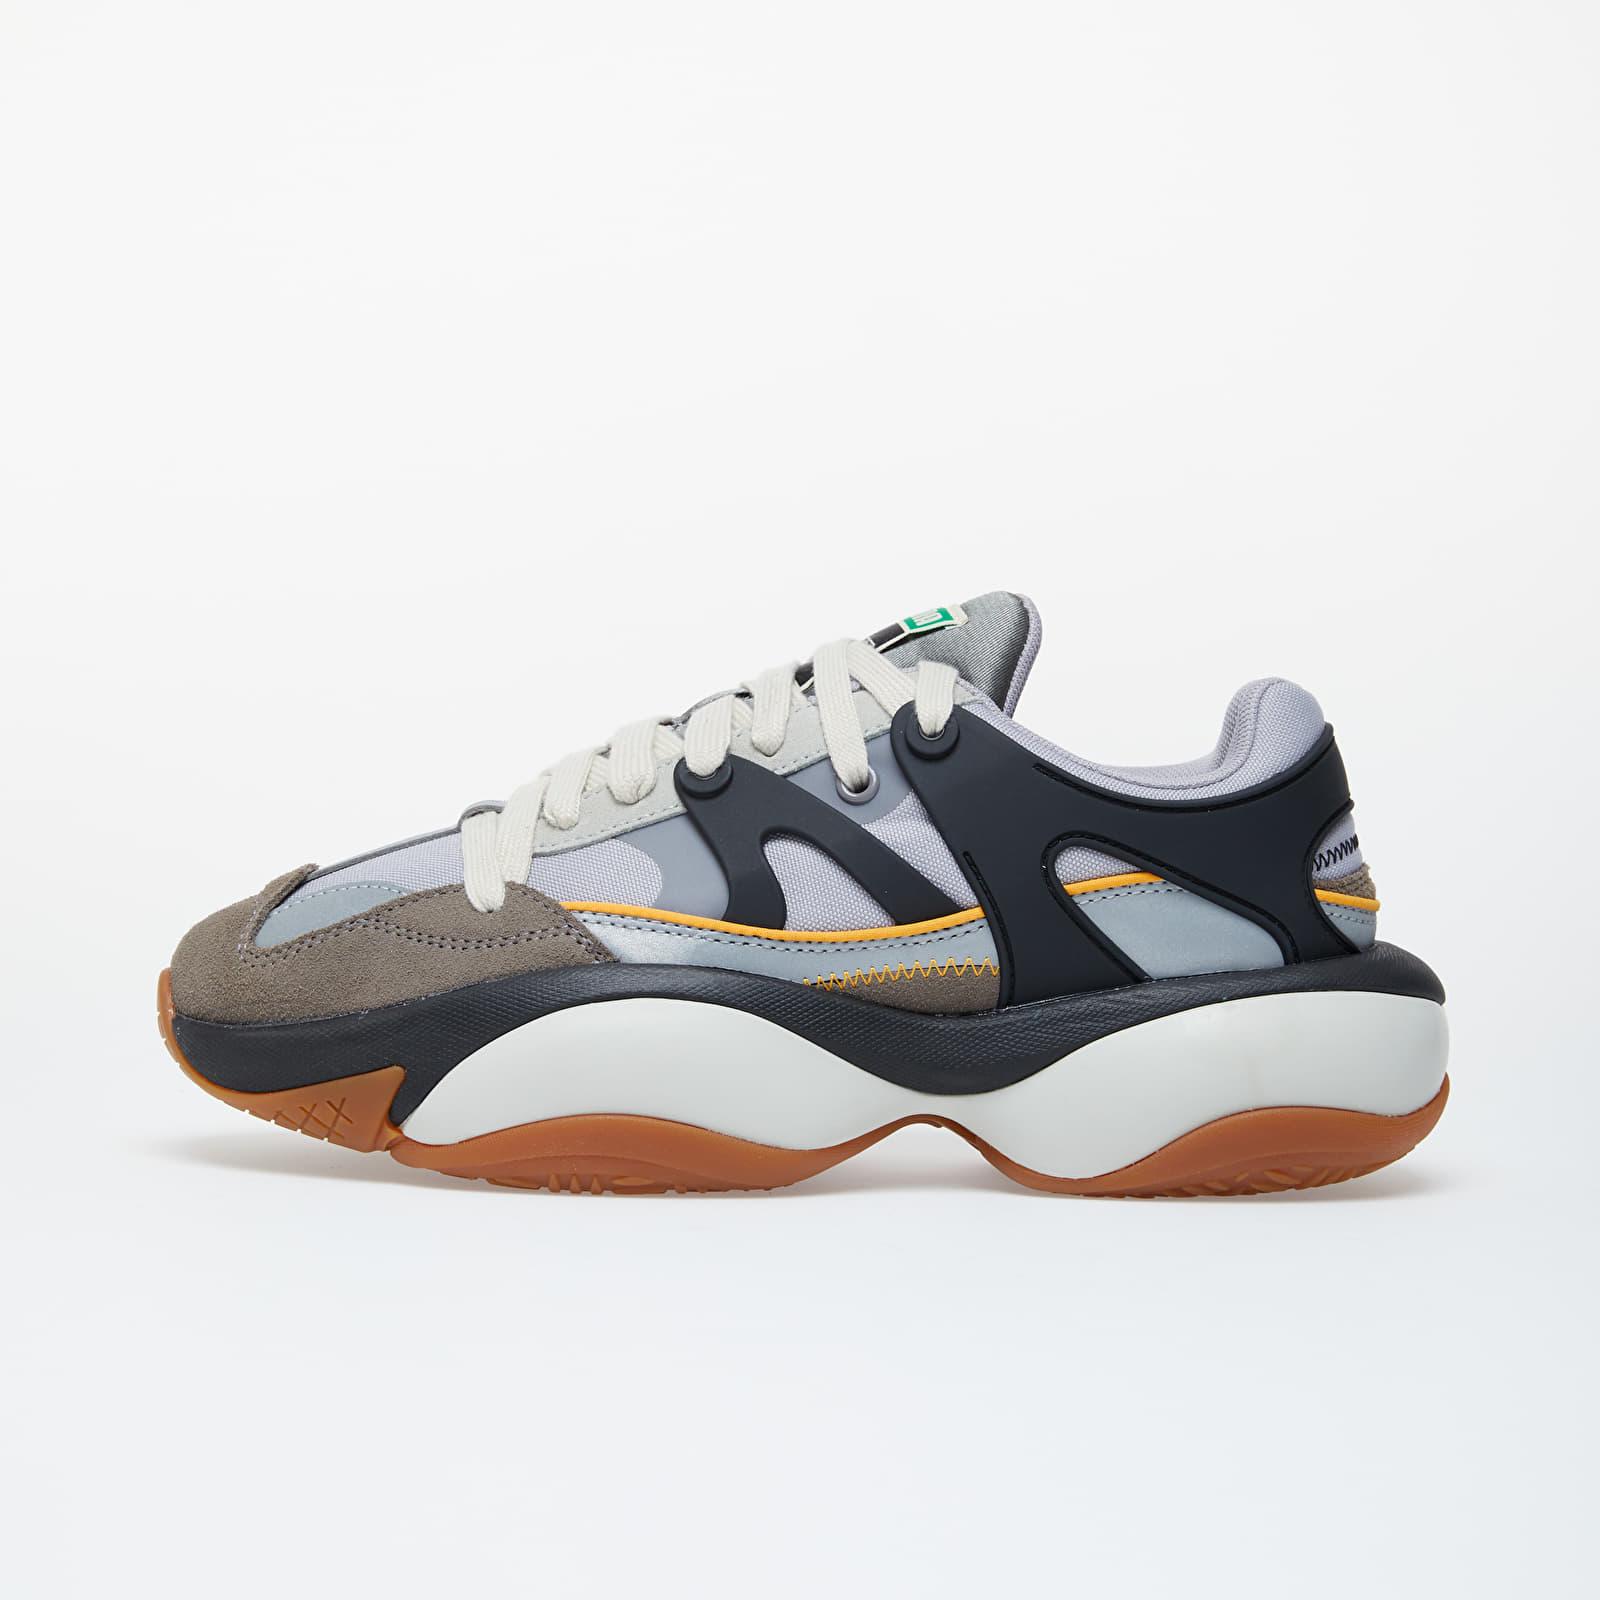 Pánské tenisky a boty Puma x Rhude Alteration Nu Steel Gray-Drizzle